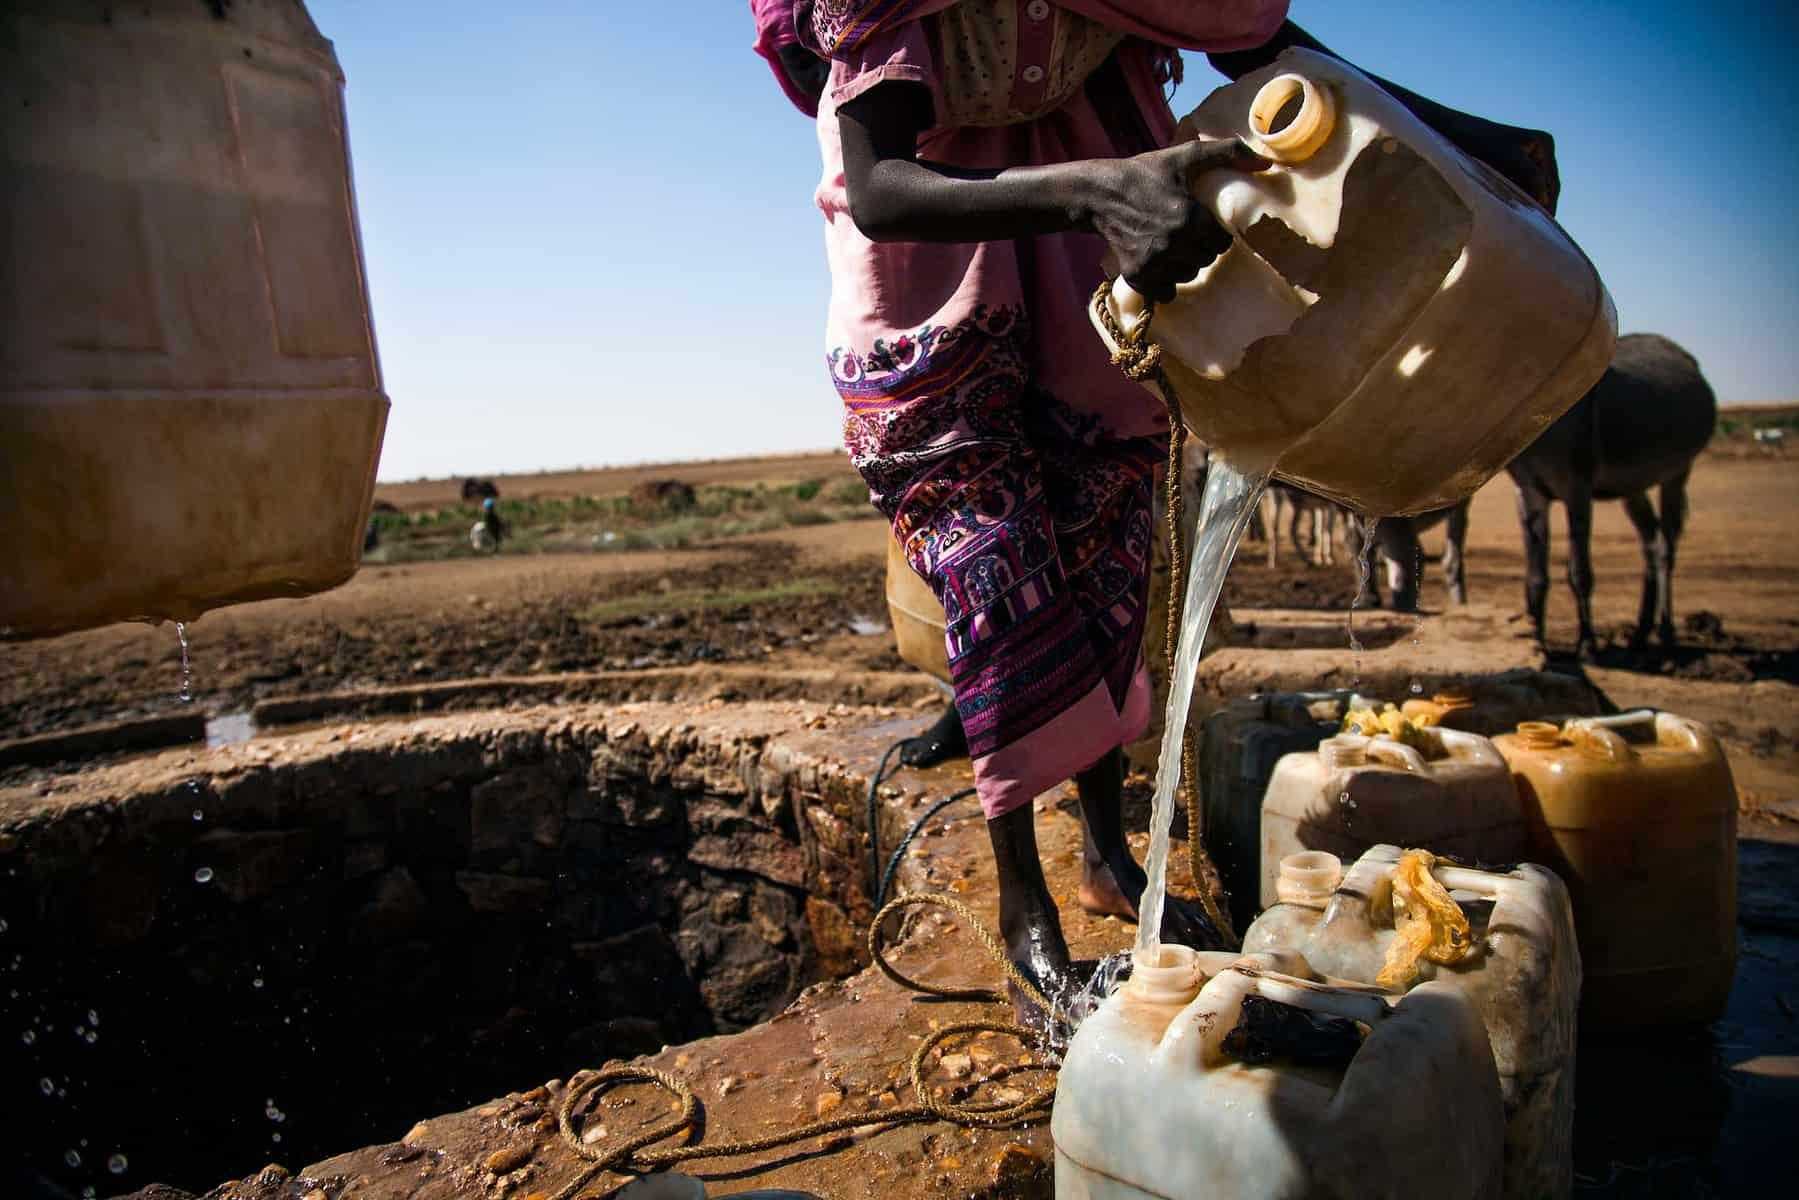 © Albert Gonzlez Farran - UNAMID